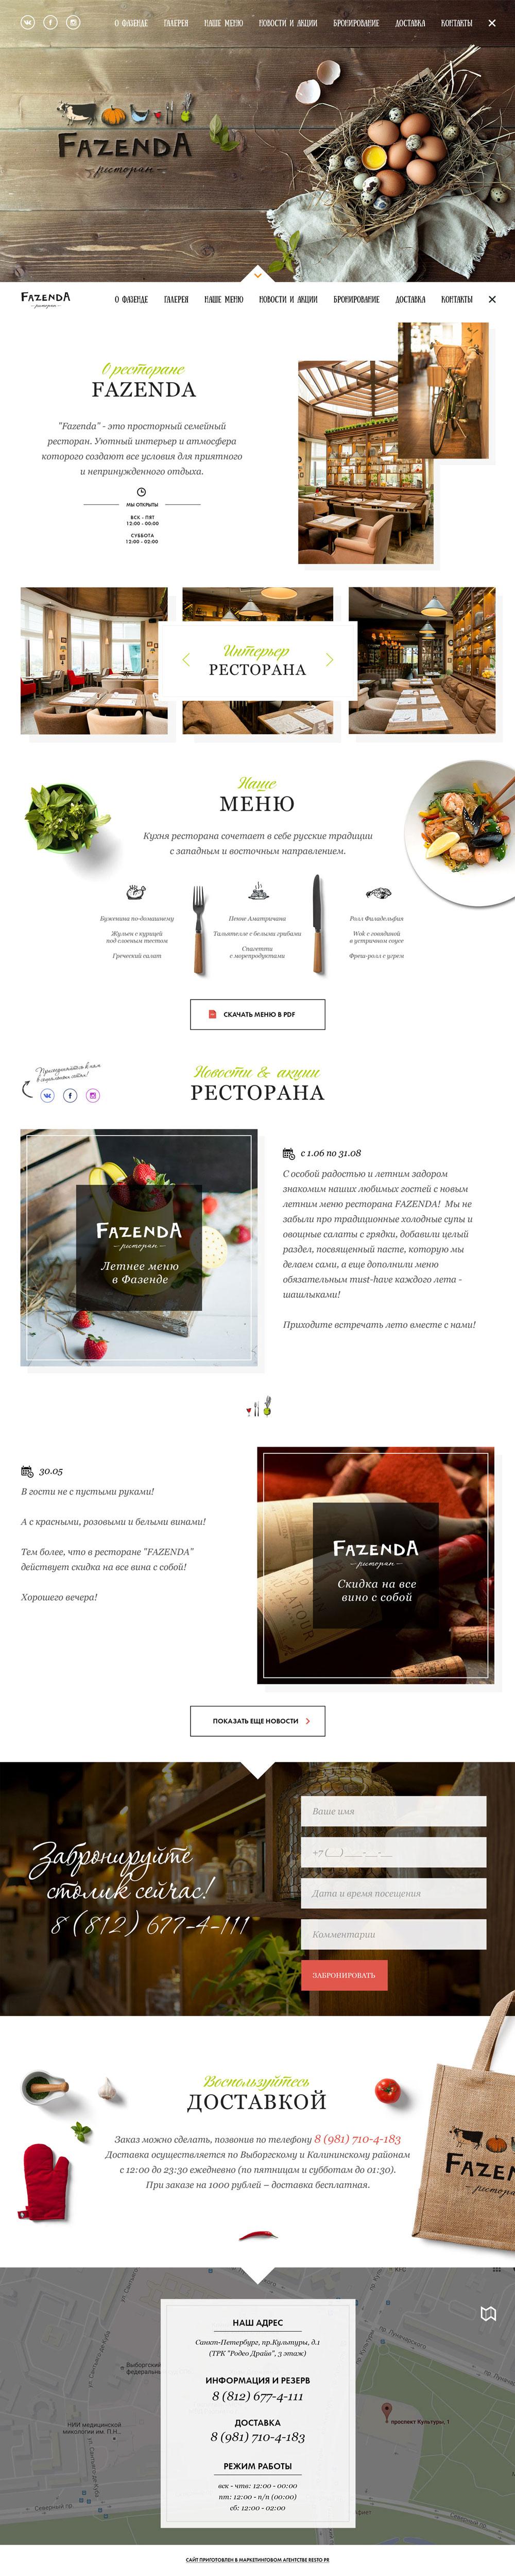 Сайт ресторана Fazenda